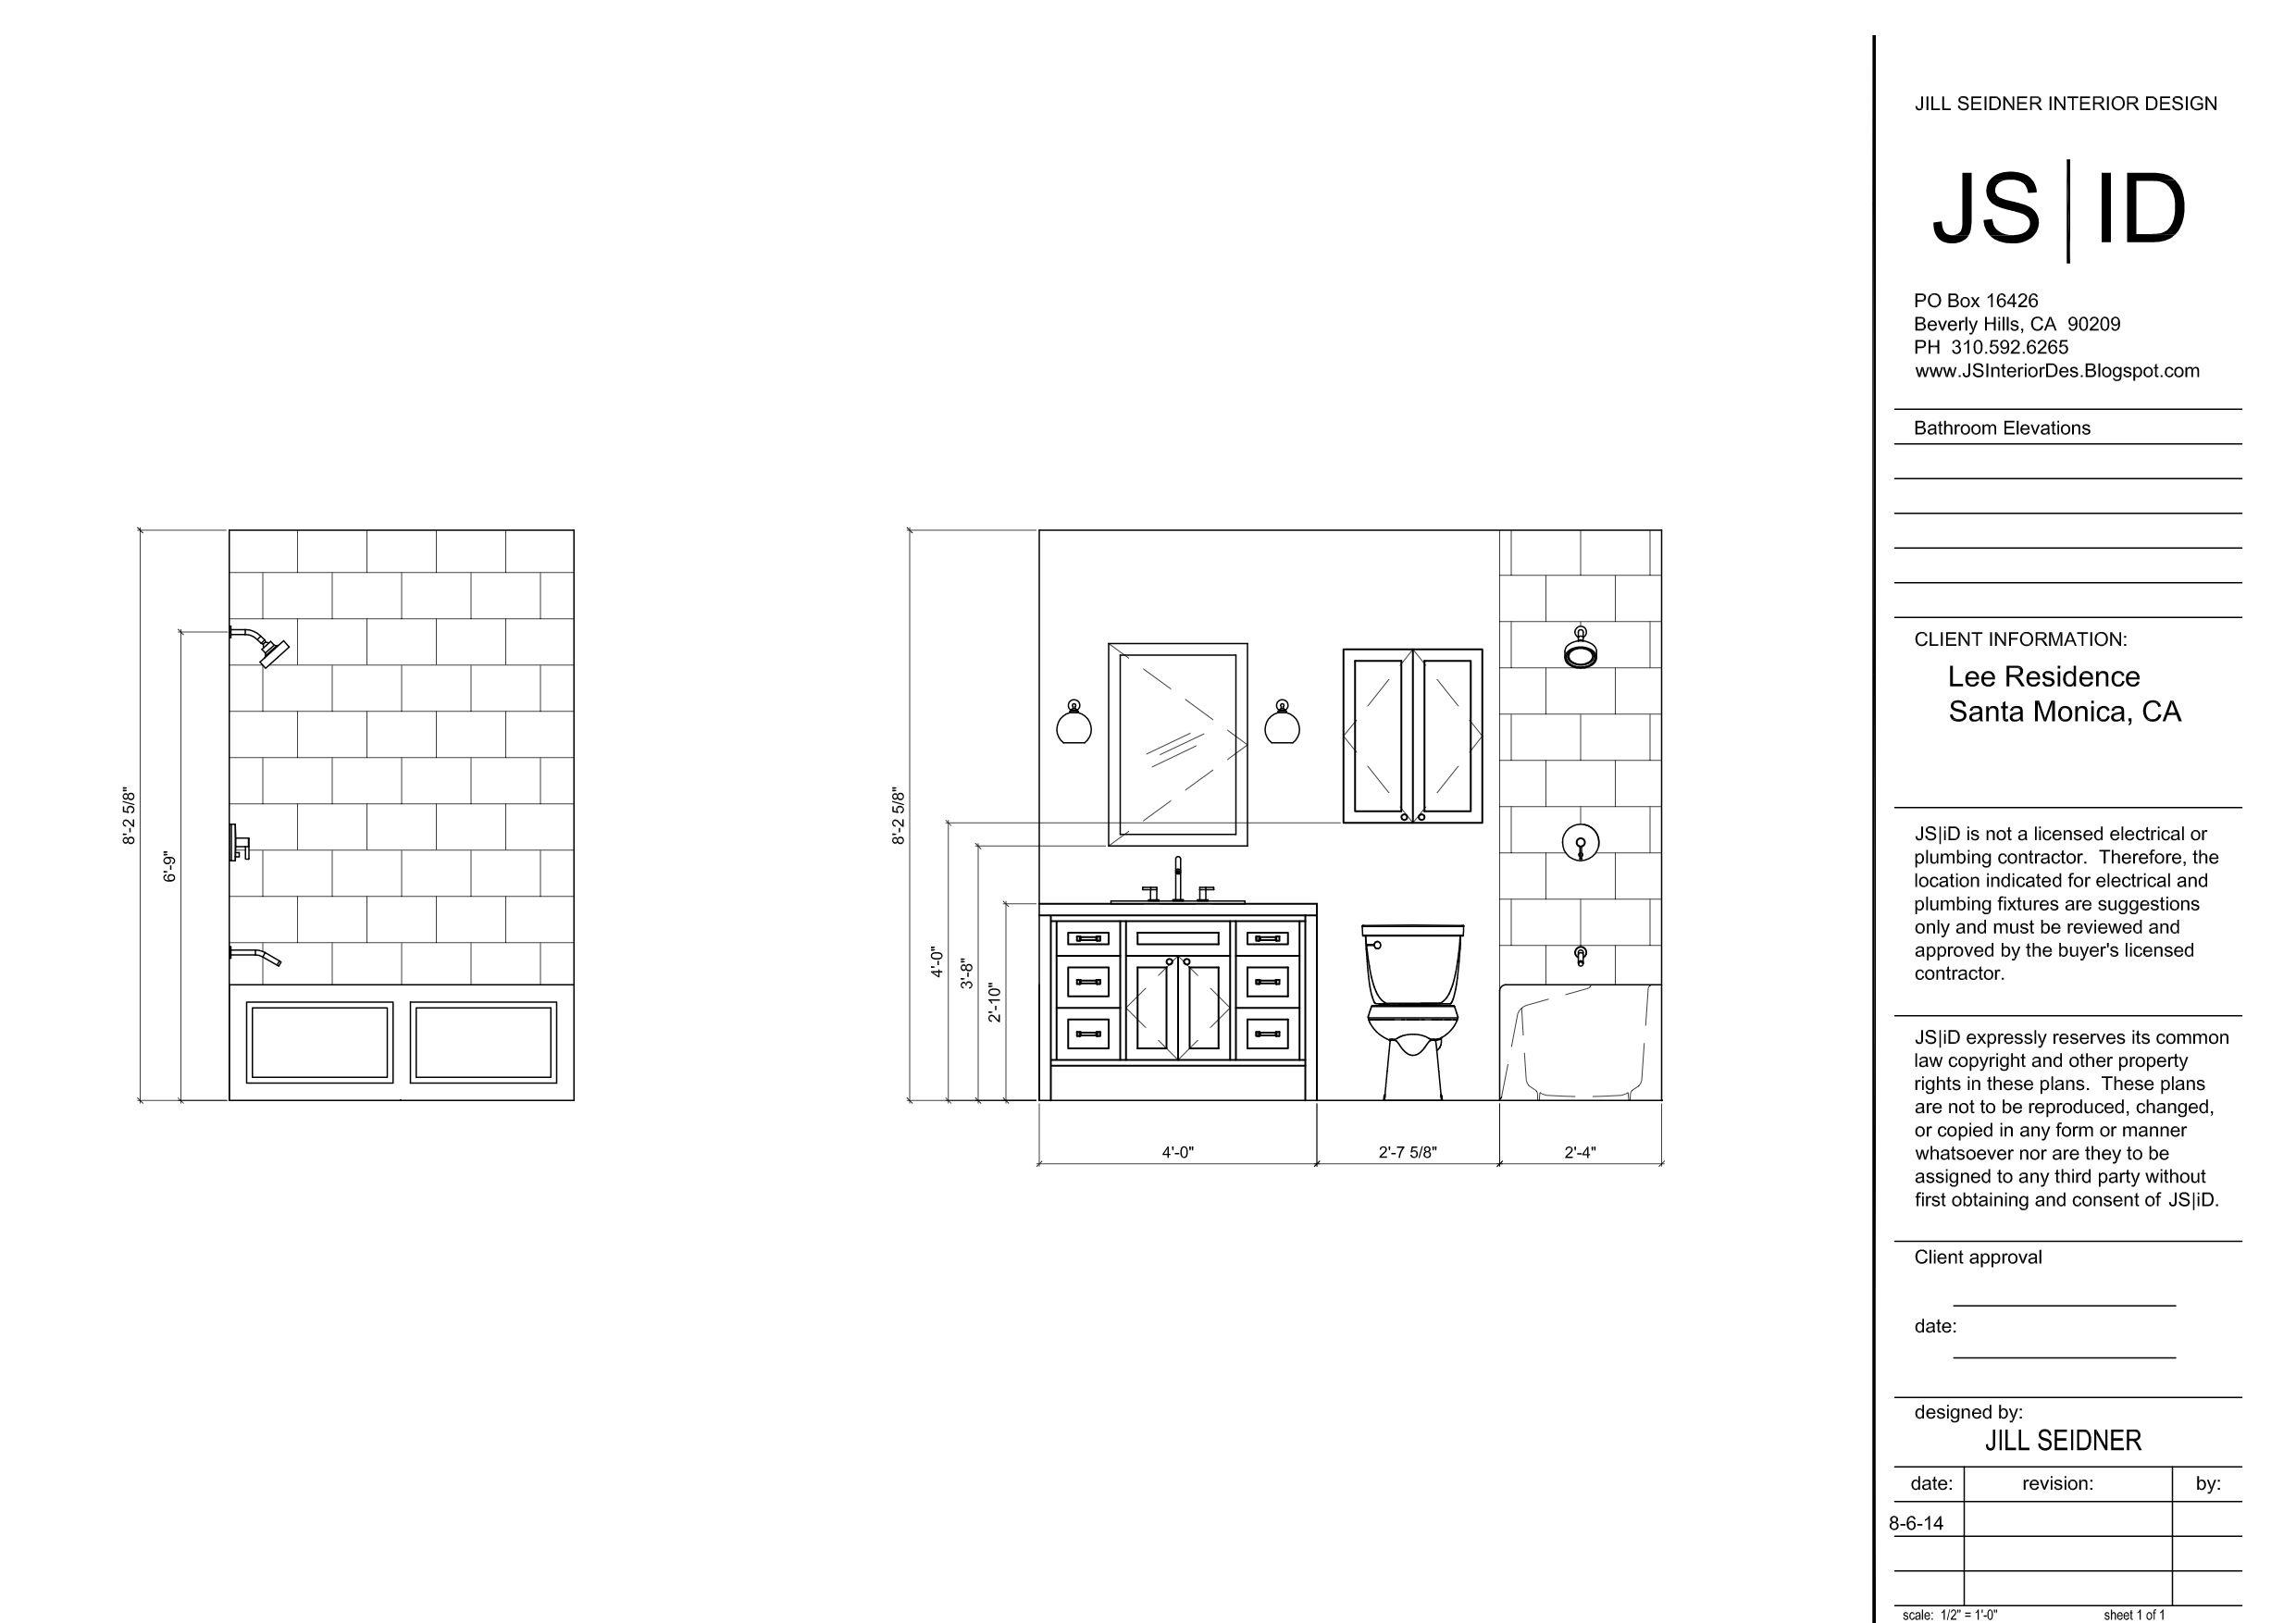 Santa Monica CA Townhouse Bathroom Remodel Elevation Drawings Www - Bathroom remodel santa monica